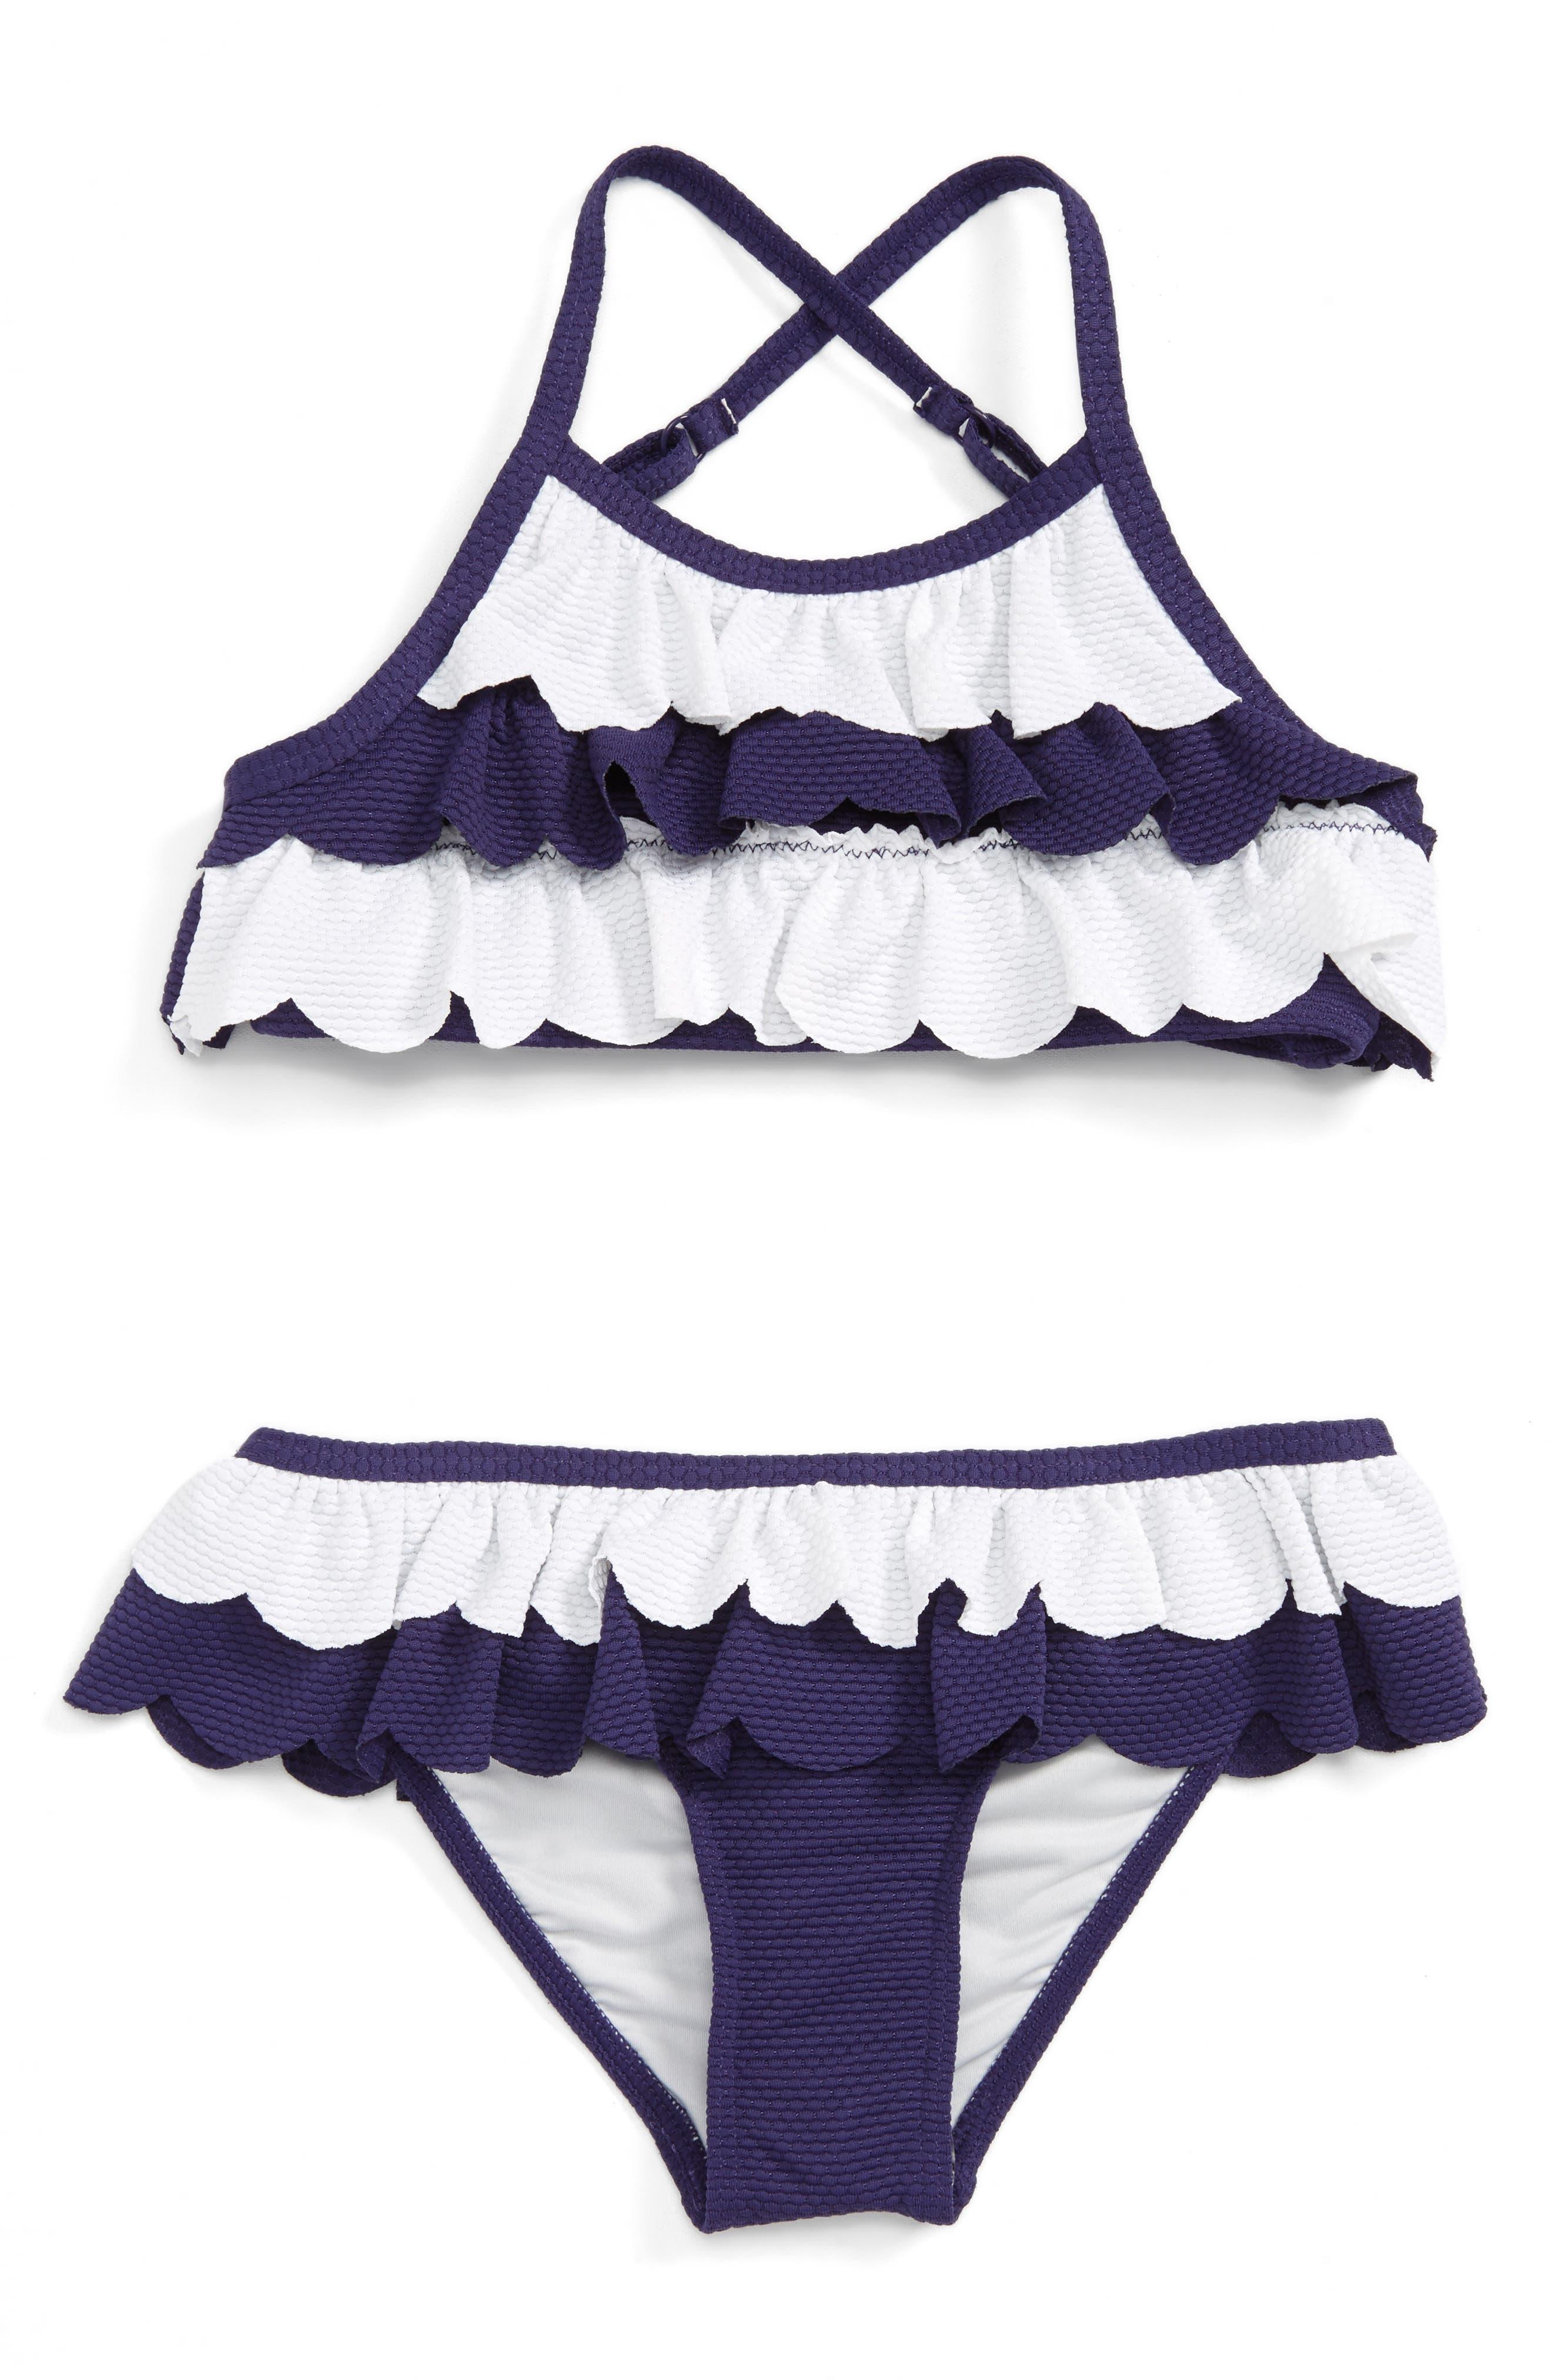 Alternate Image 1 Selected - Tucker + Tate Scallop Two-Piece Swimsuit (Toddler Girls, Little Girls & Big Girls)